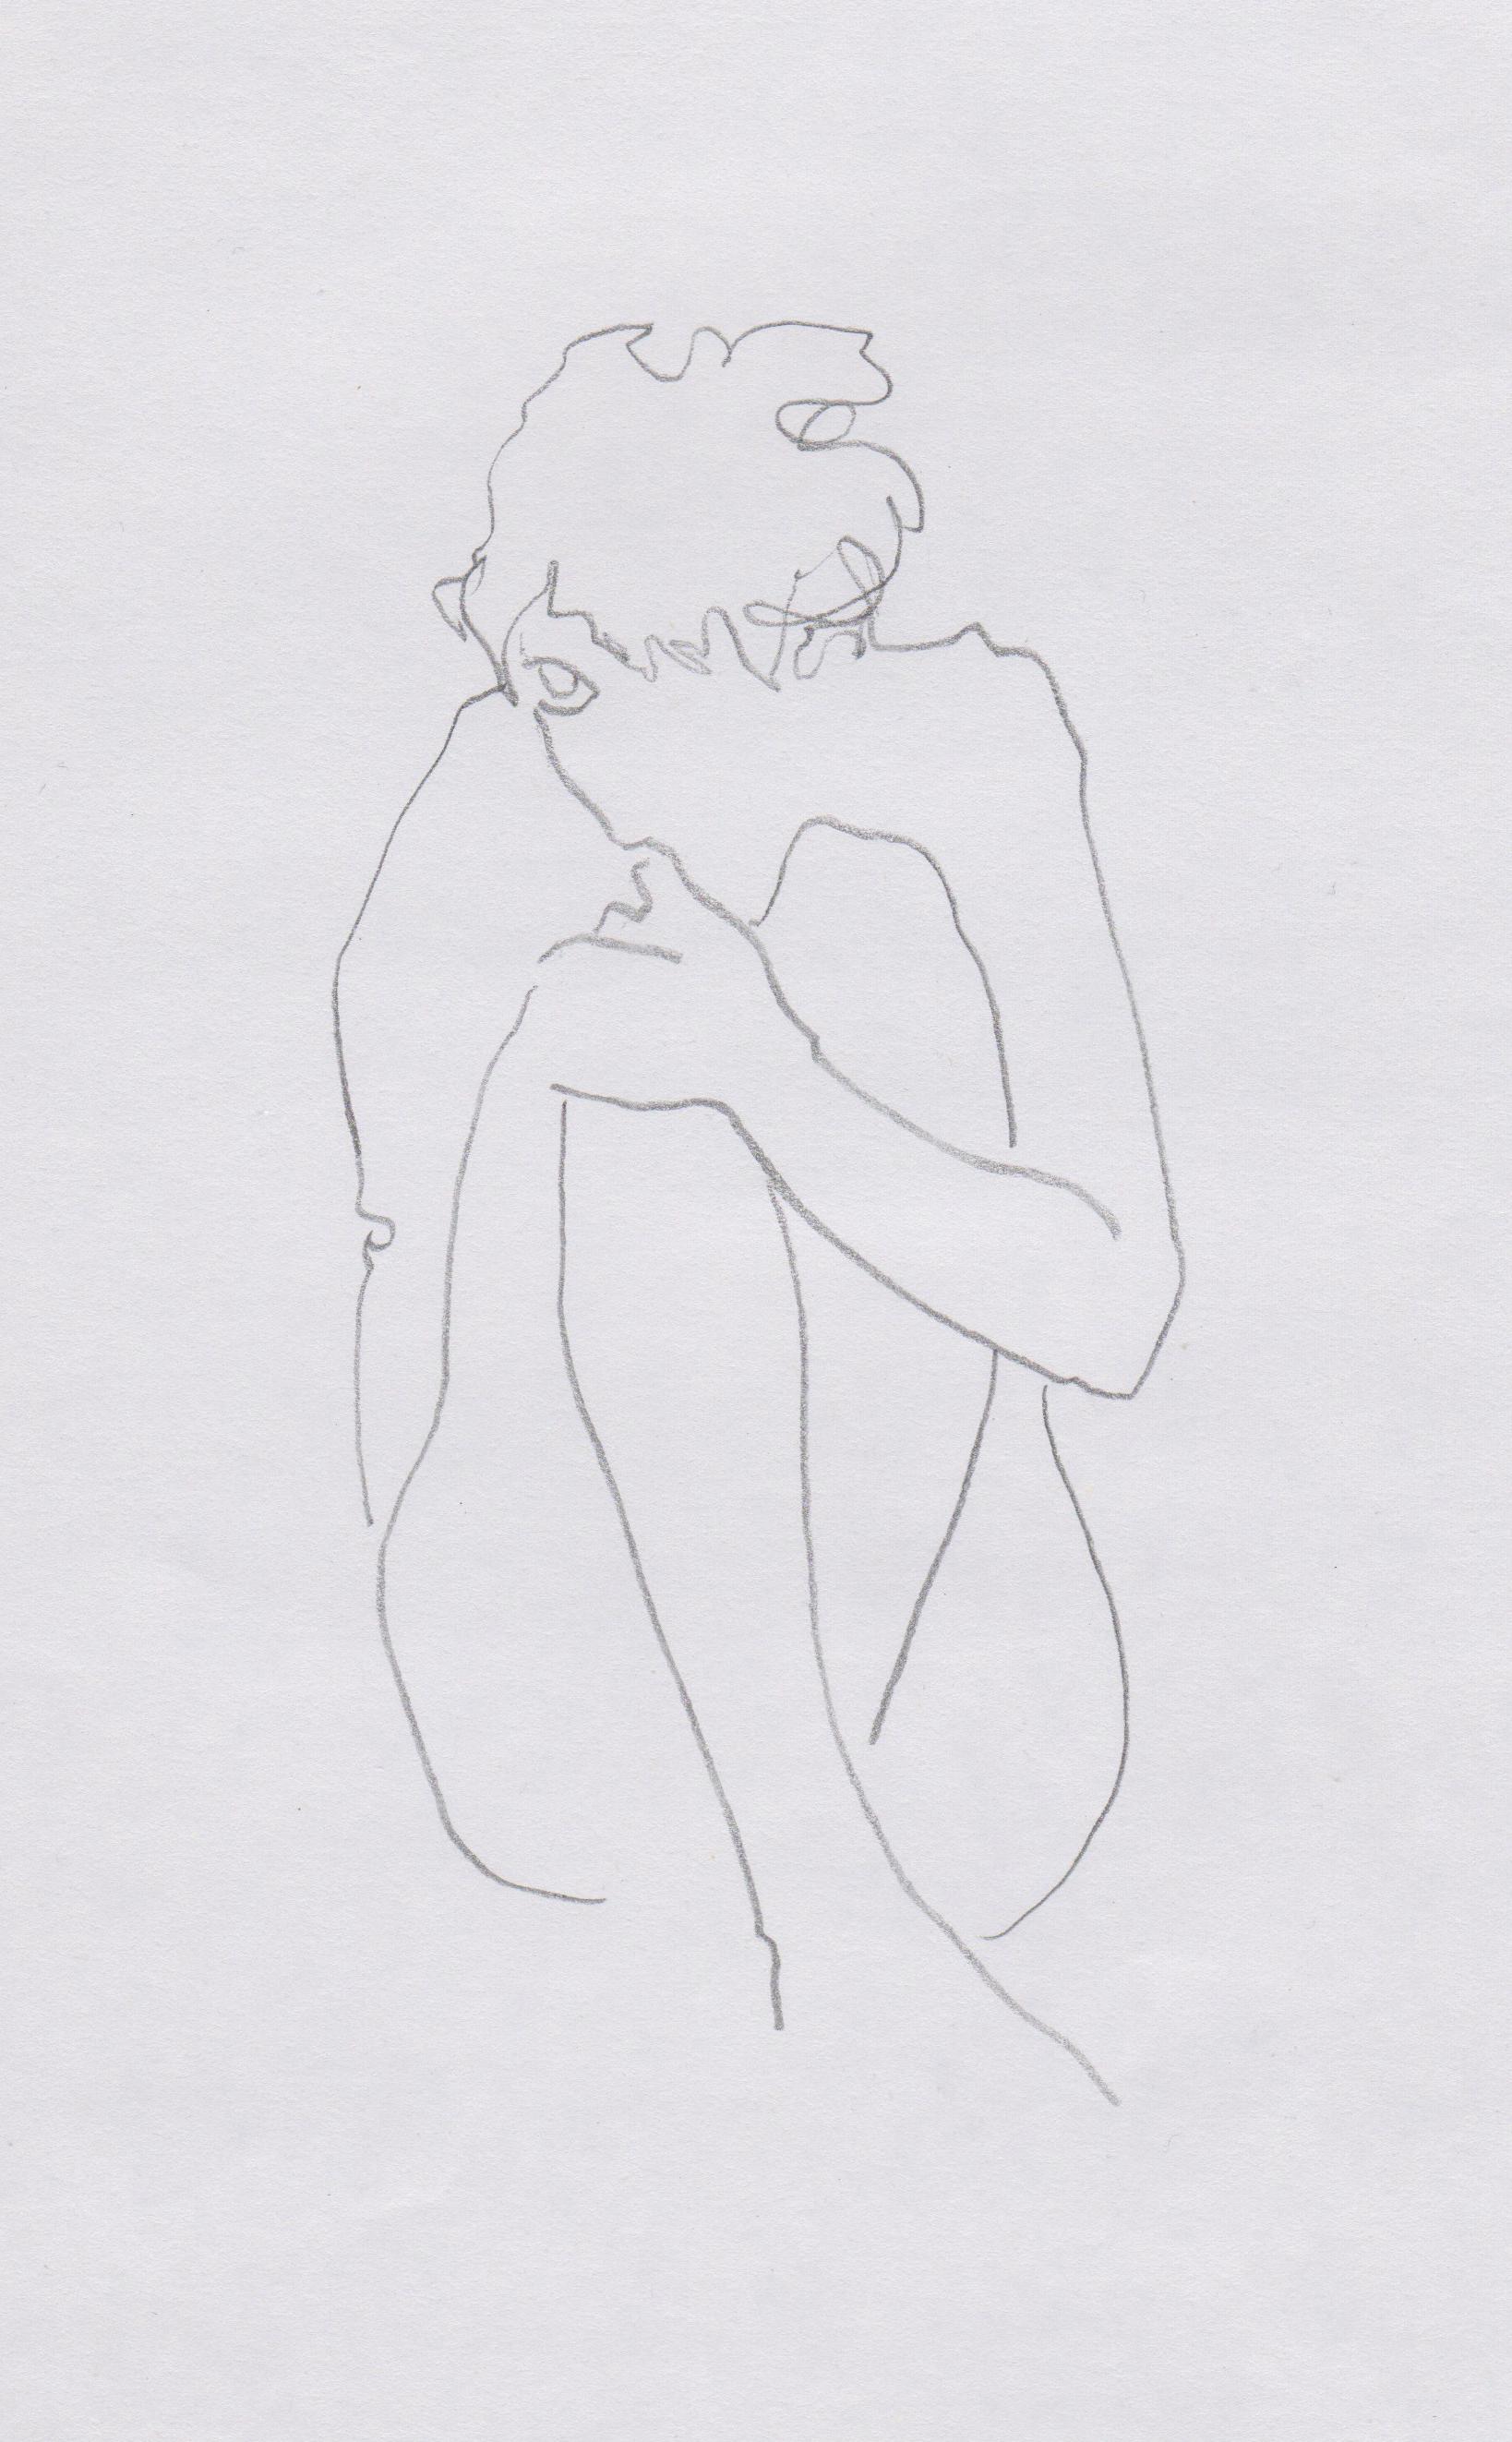 2016_Sketch_F-Beudin_Pia-Haufert_02